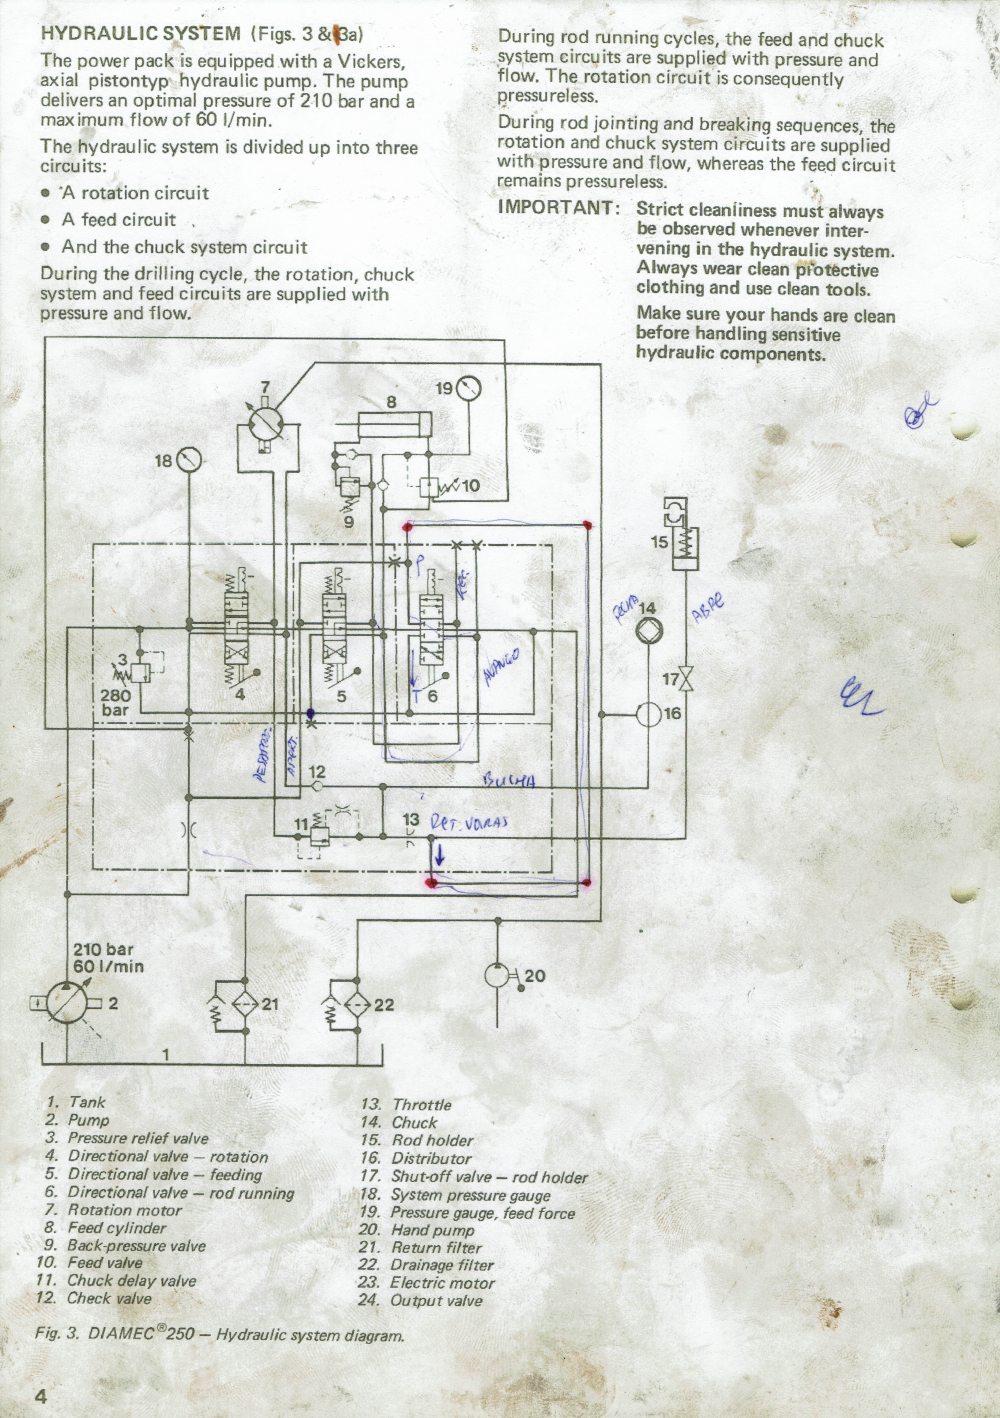 medium resolution of hydraulic control panel for diamec 250 core drilling rig based on danfoss pvg32 valve